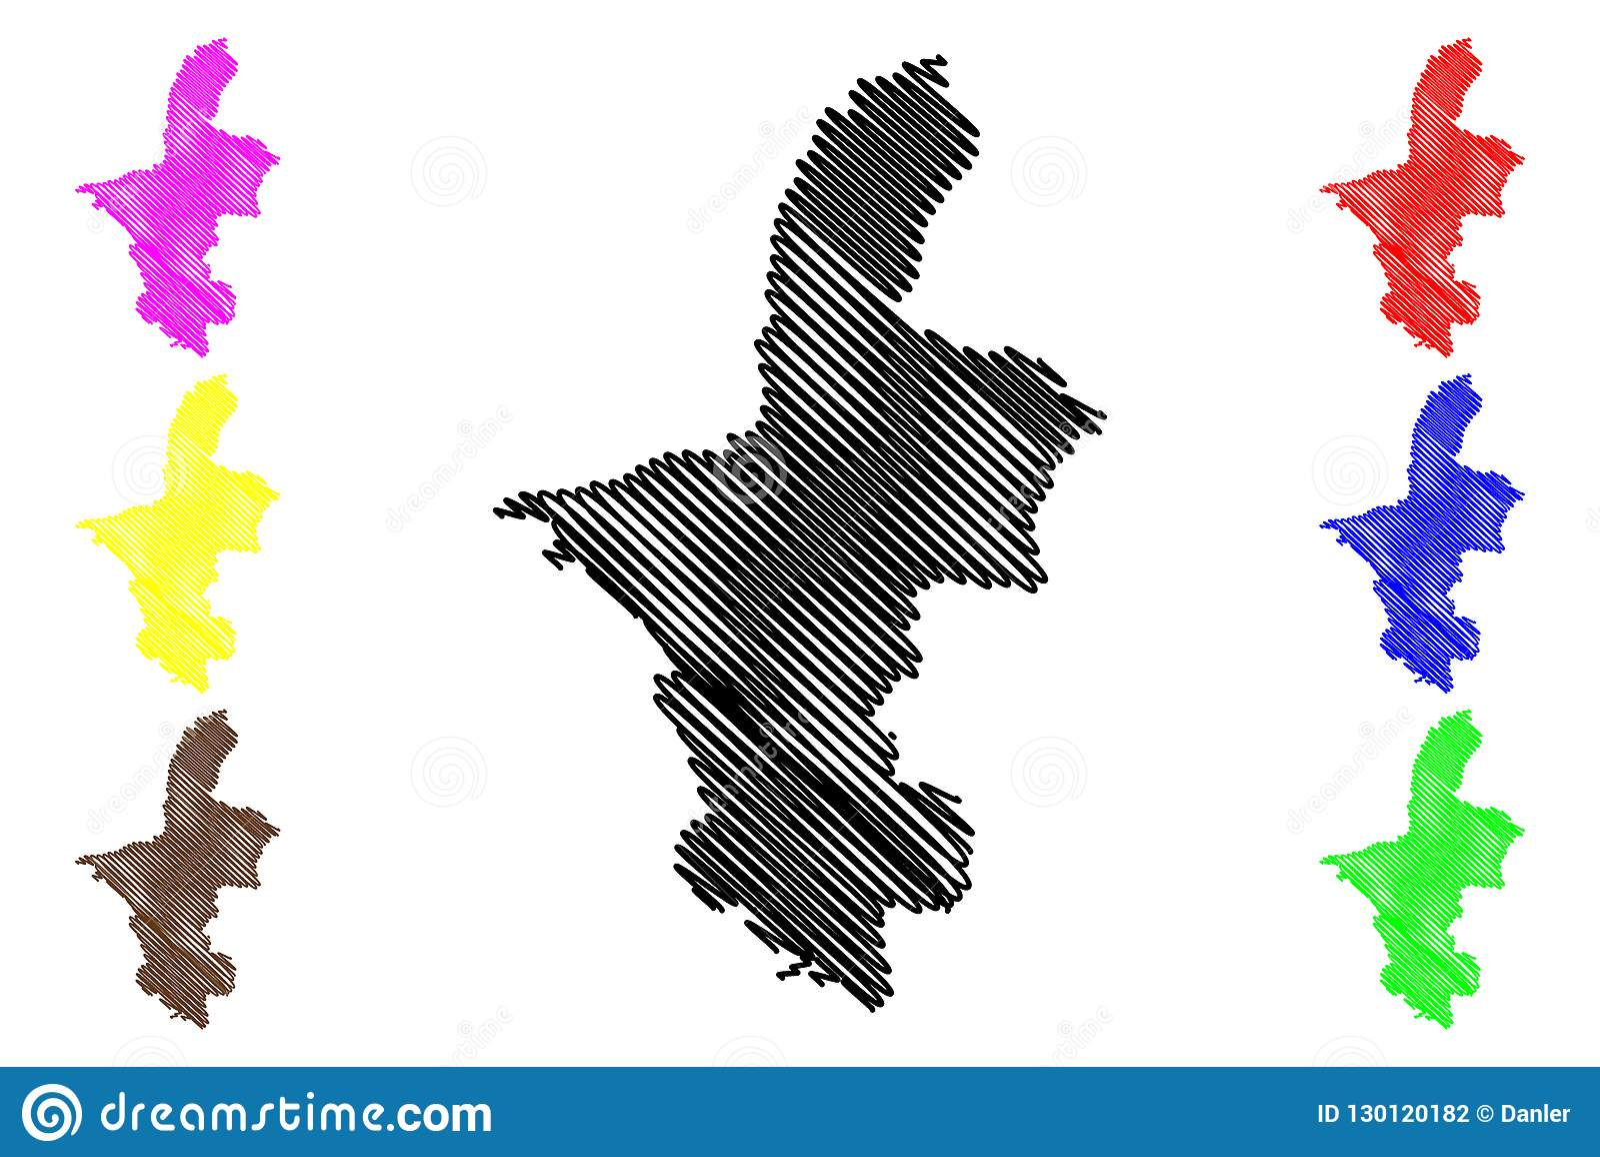 Ningxia China Map.Ningxia Hui Autonomous Region Map Vector Stock Vector Illustration